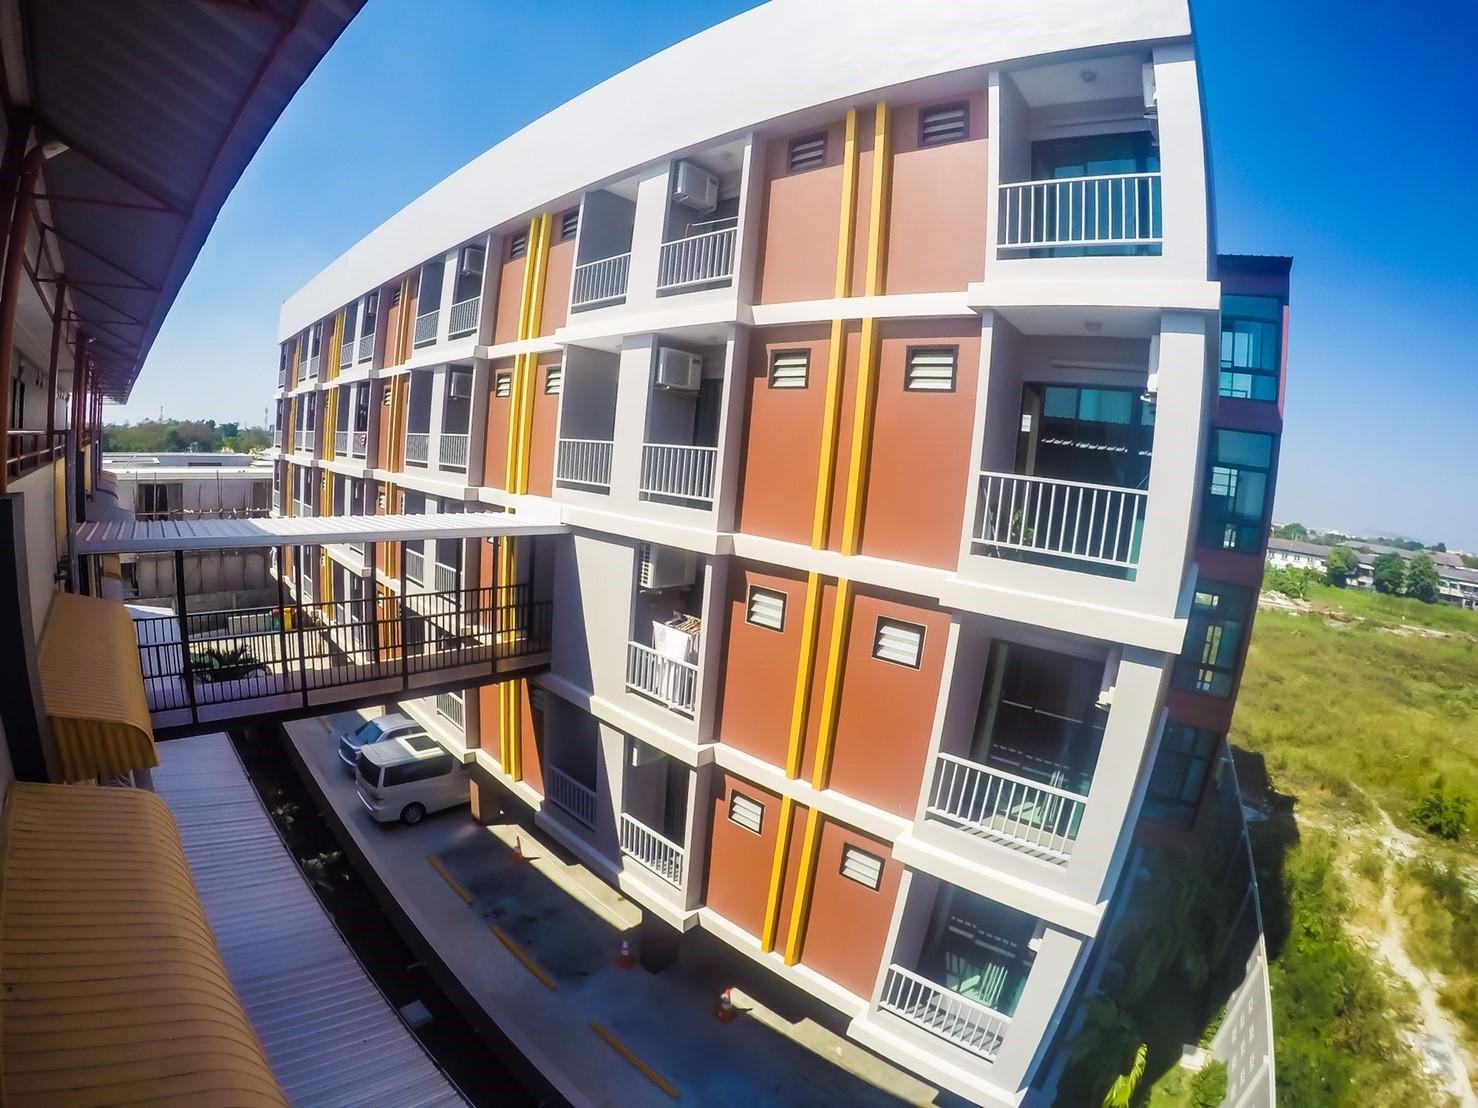 Nuanchan Apartment, Bung Kum